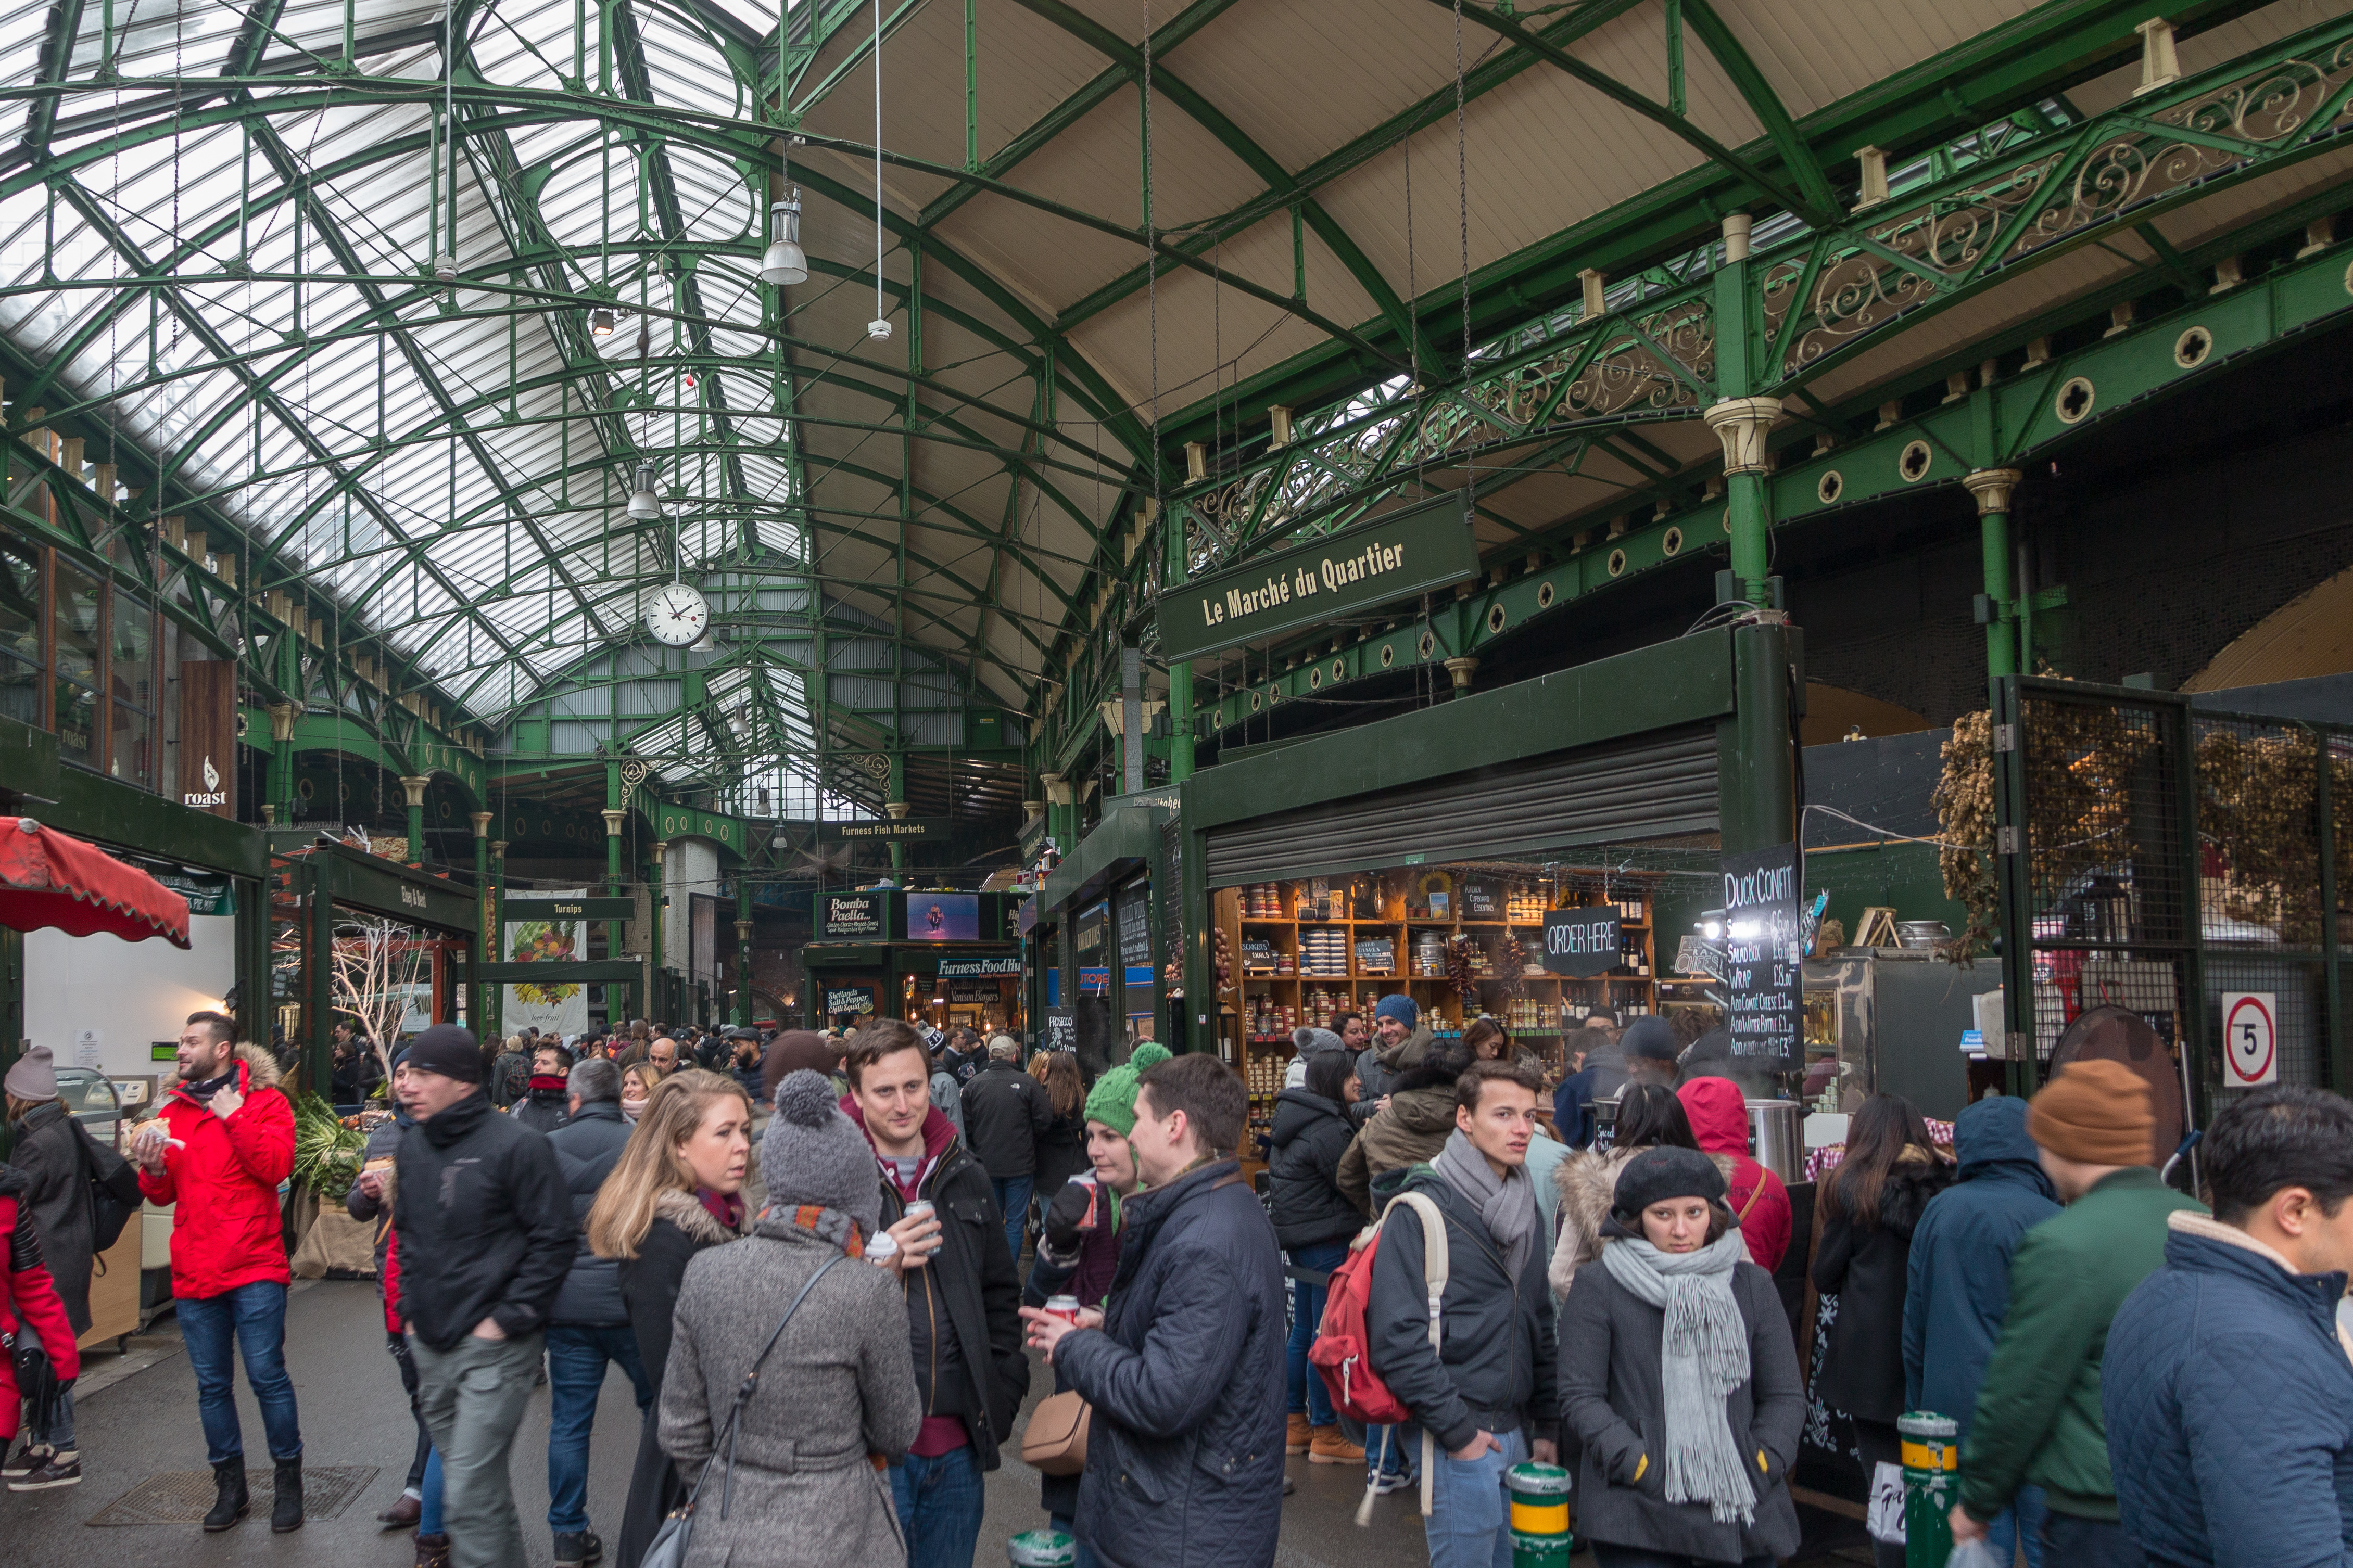 Borough Market - Wikipedia